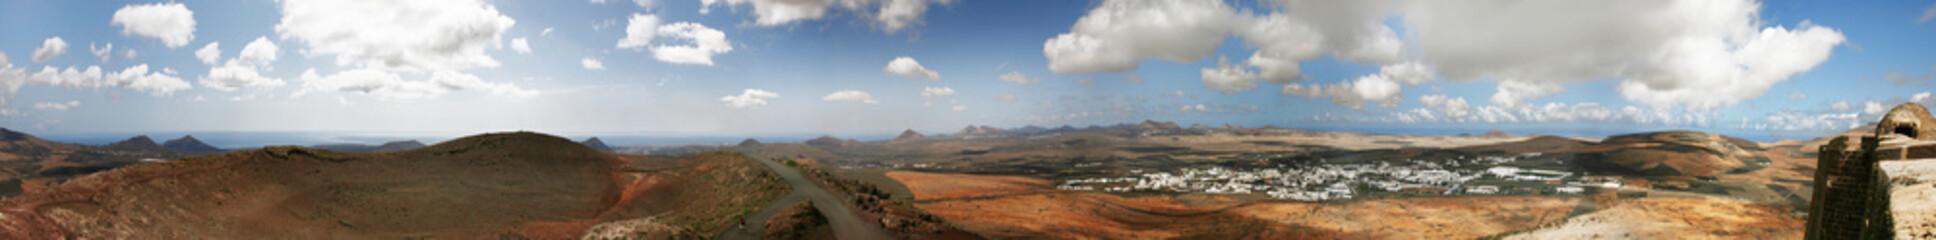 Teguise Panorama